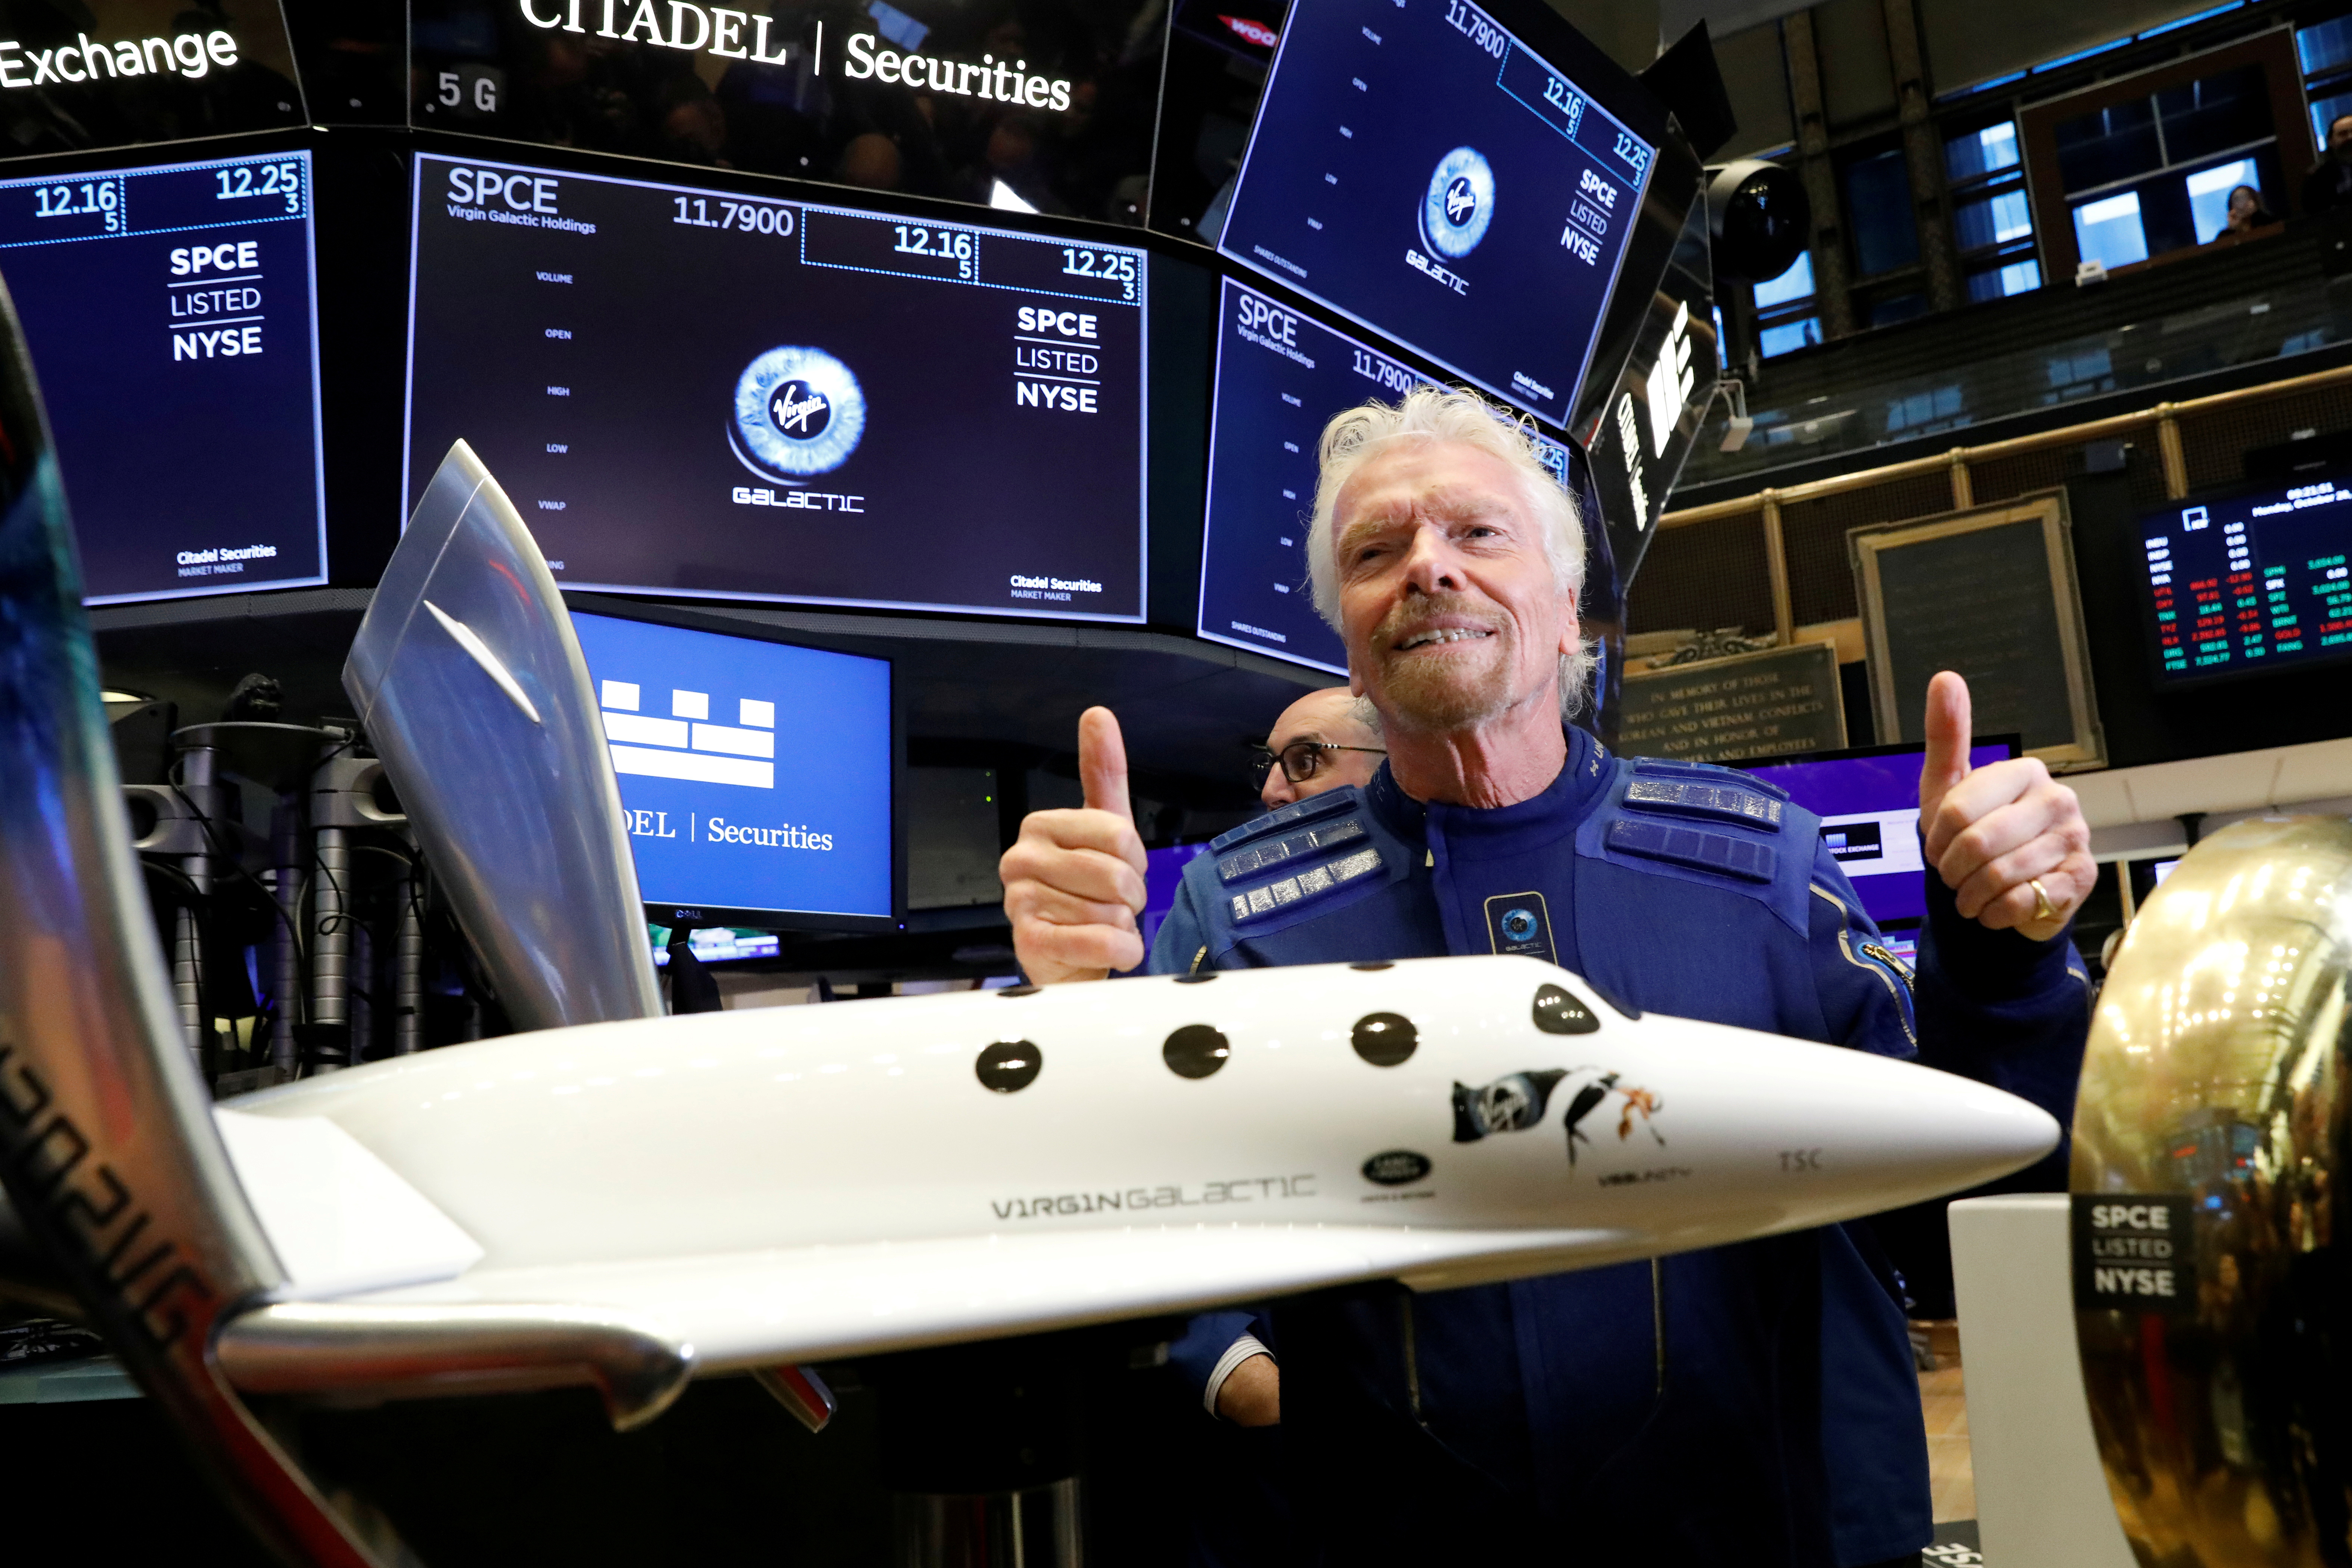 Sir Richard Branson poses on the floor of the New York Stock Exchange (NYSE) ahead of Virgin Galactic (SPCE) trading in New York, U.S., October 28, 2019. REUTERS/Brendan McDermid